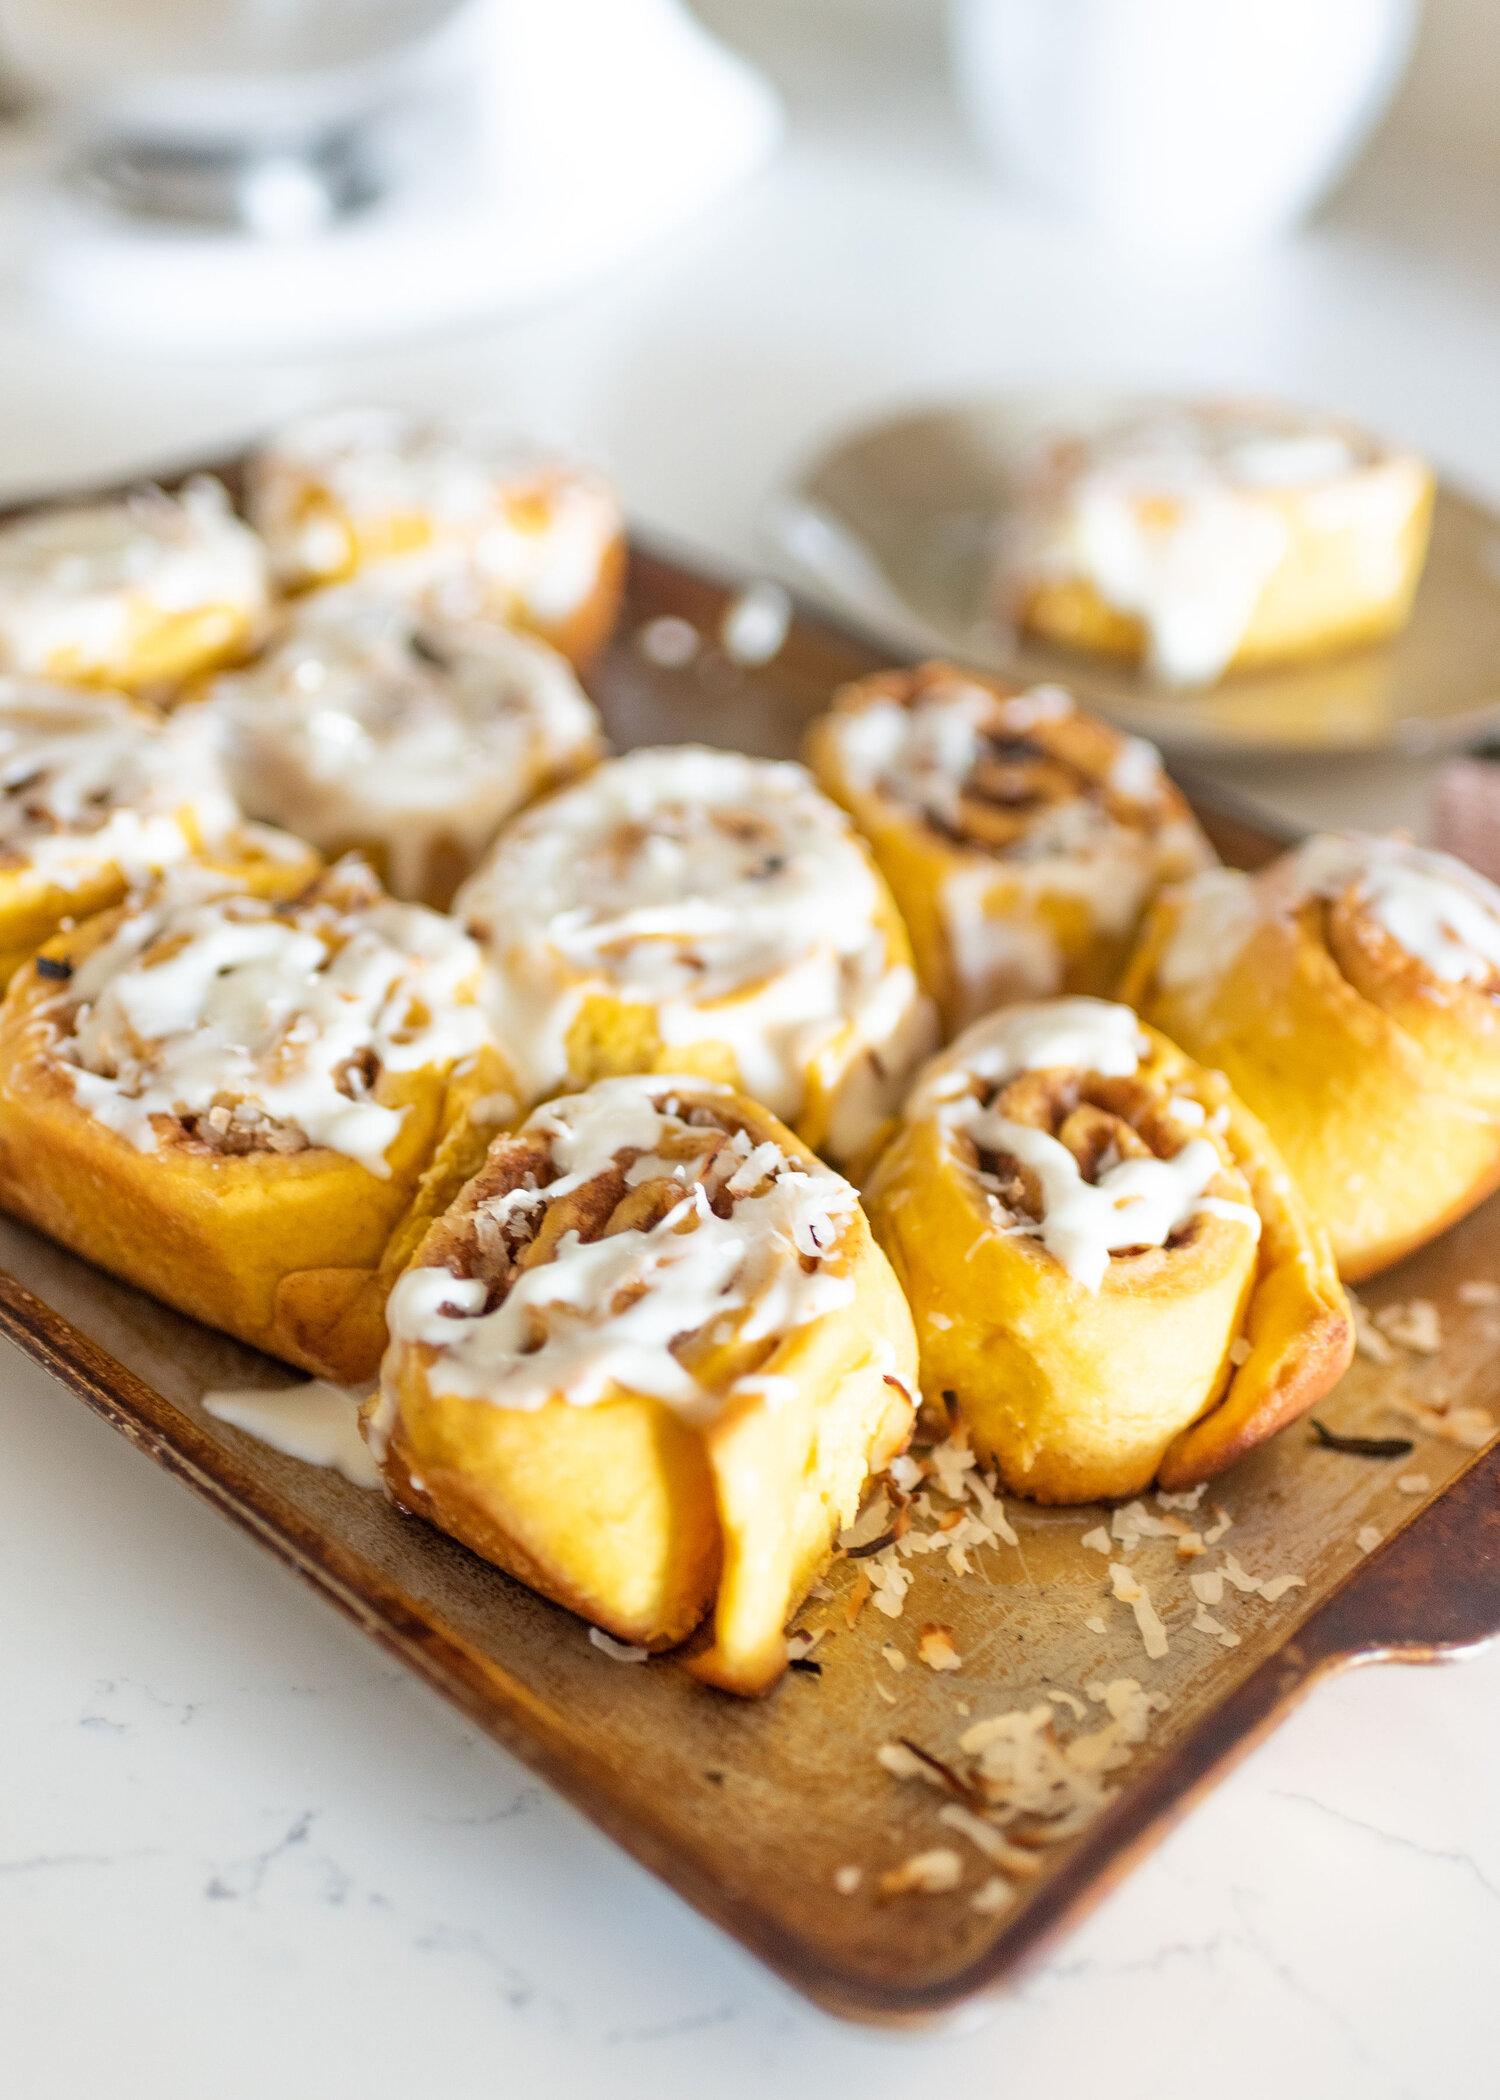 Sweet Potato Cinnamon Rolls with coconut — Vee the Baker